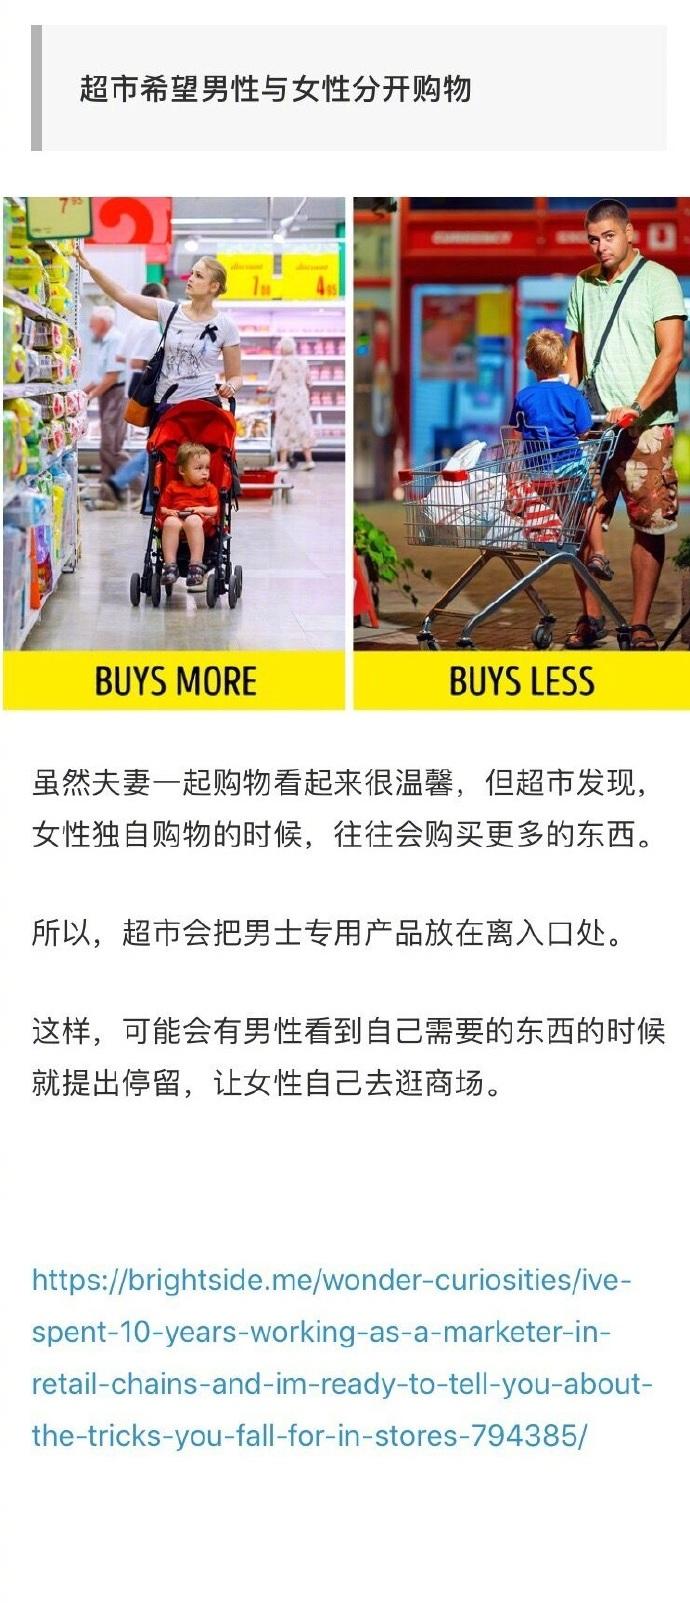 BrightSide总结了一些,超市不会告诉你的小秘密